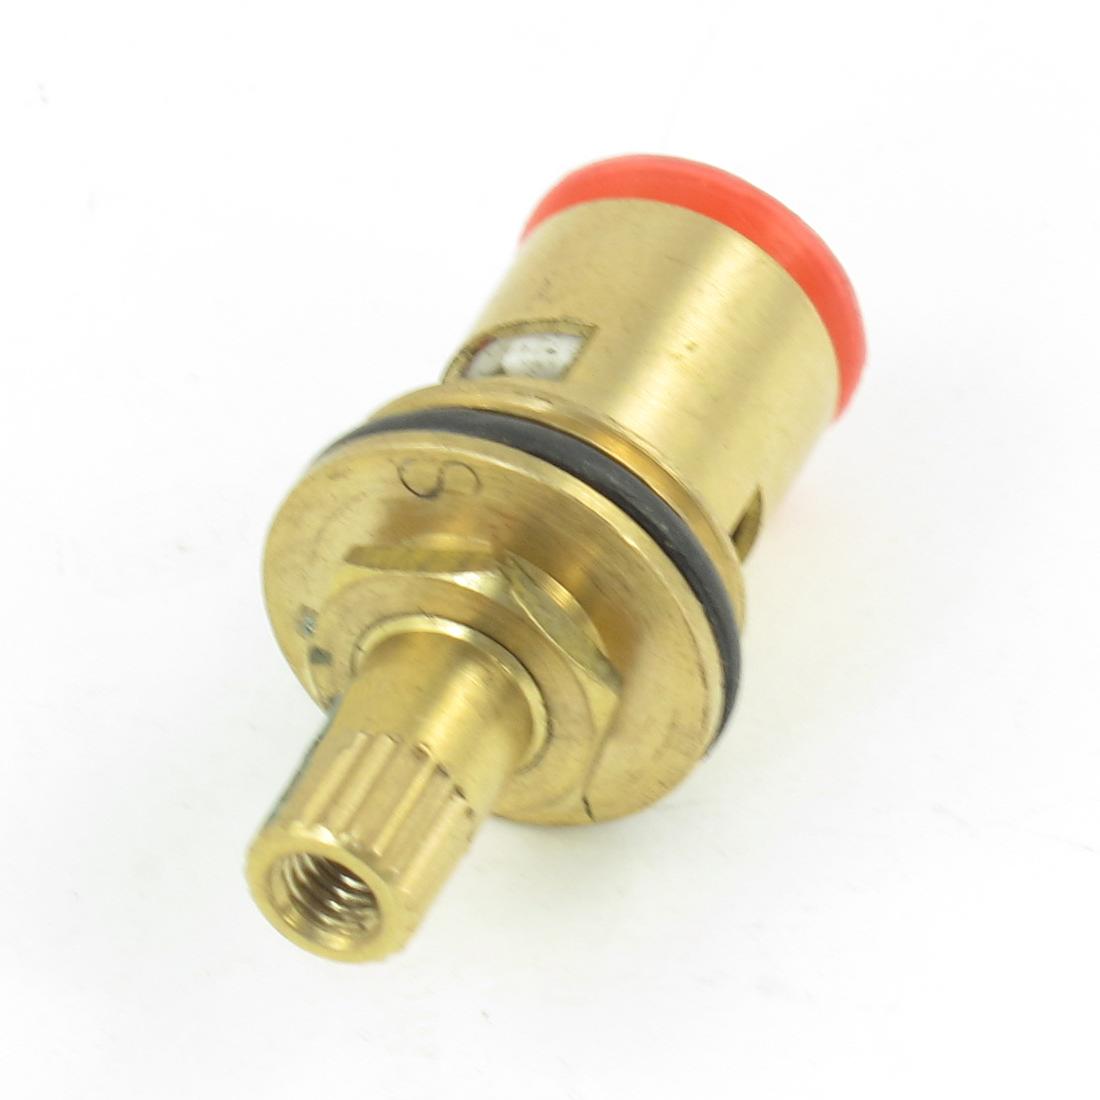 Kitchen 4.3mm Female Thread Brass Cartridge Ceramic Valve Core